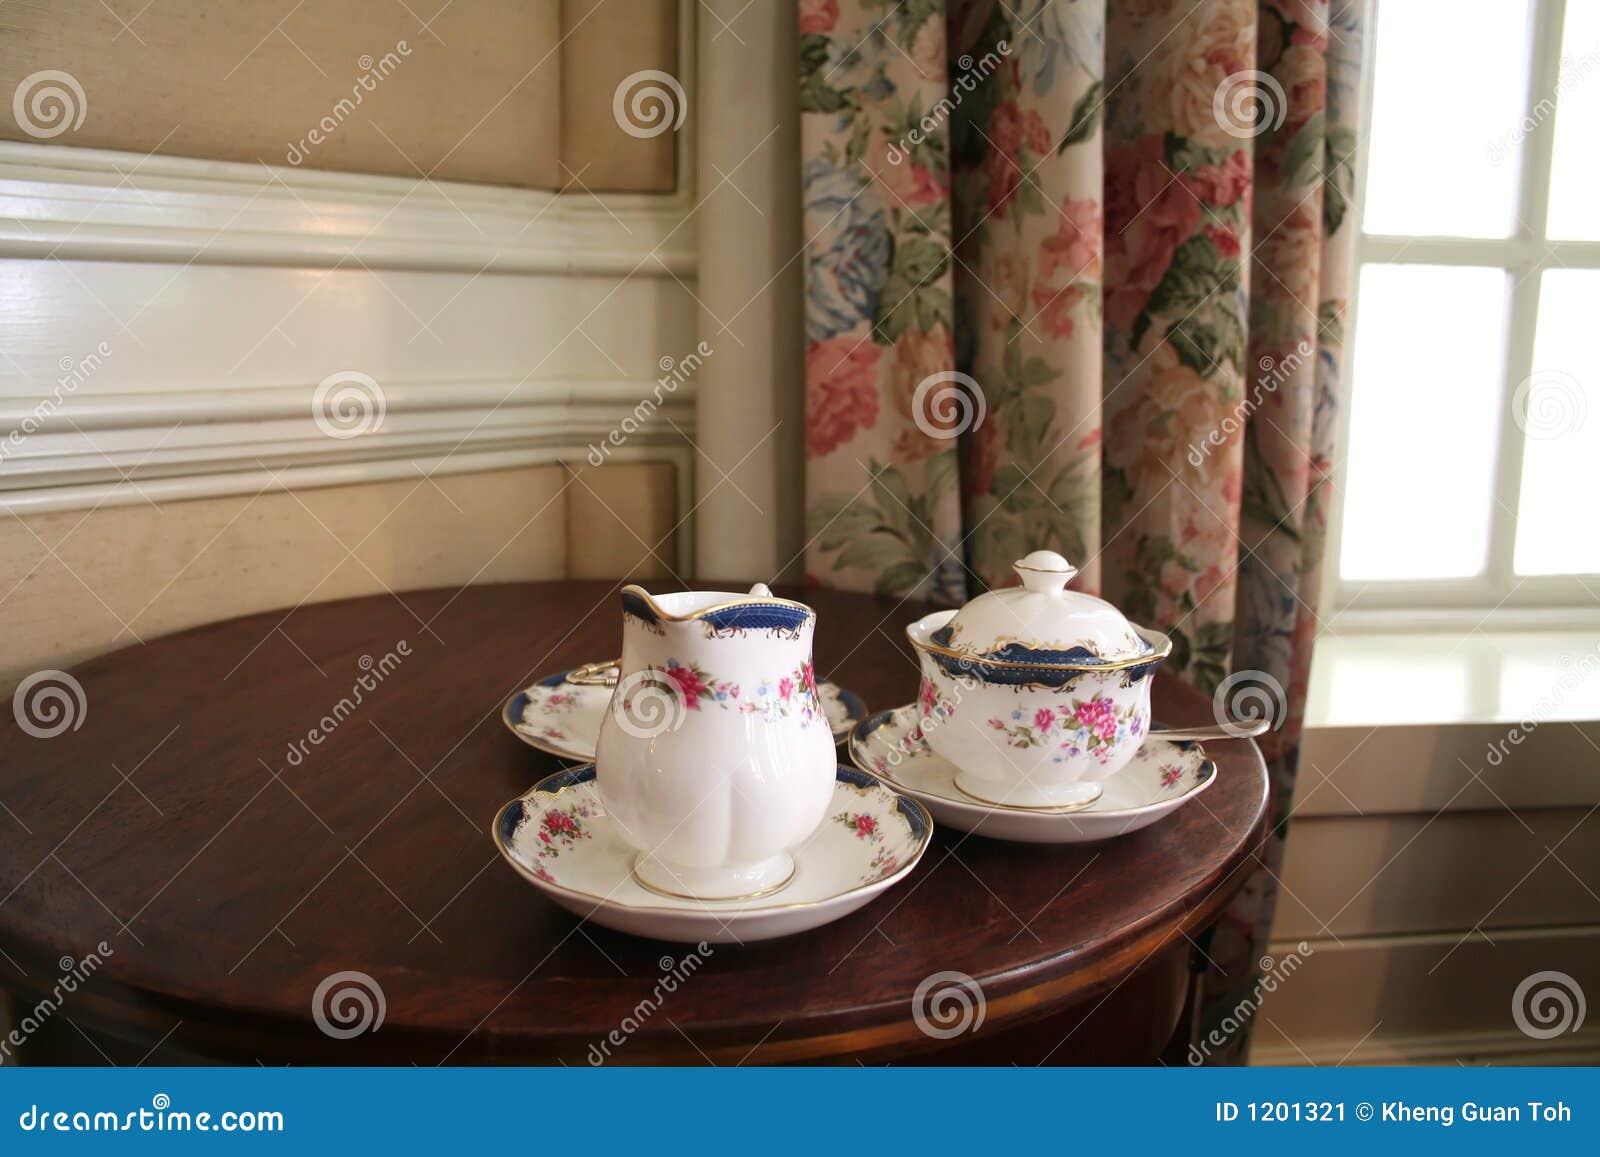 Tea laid out